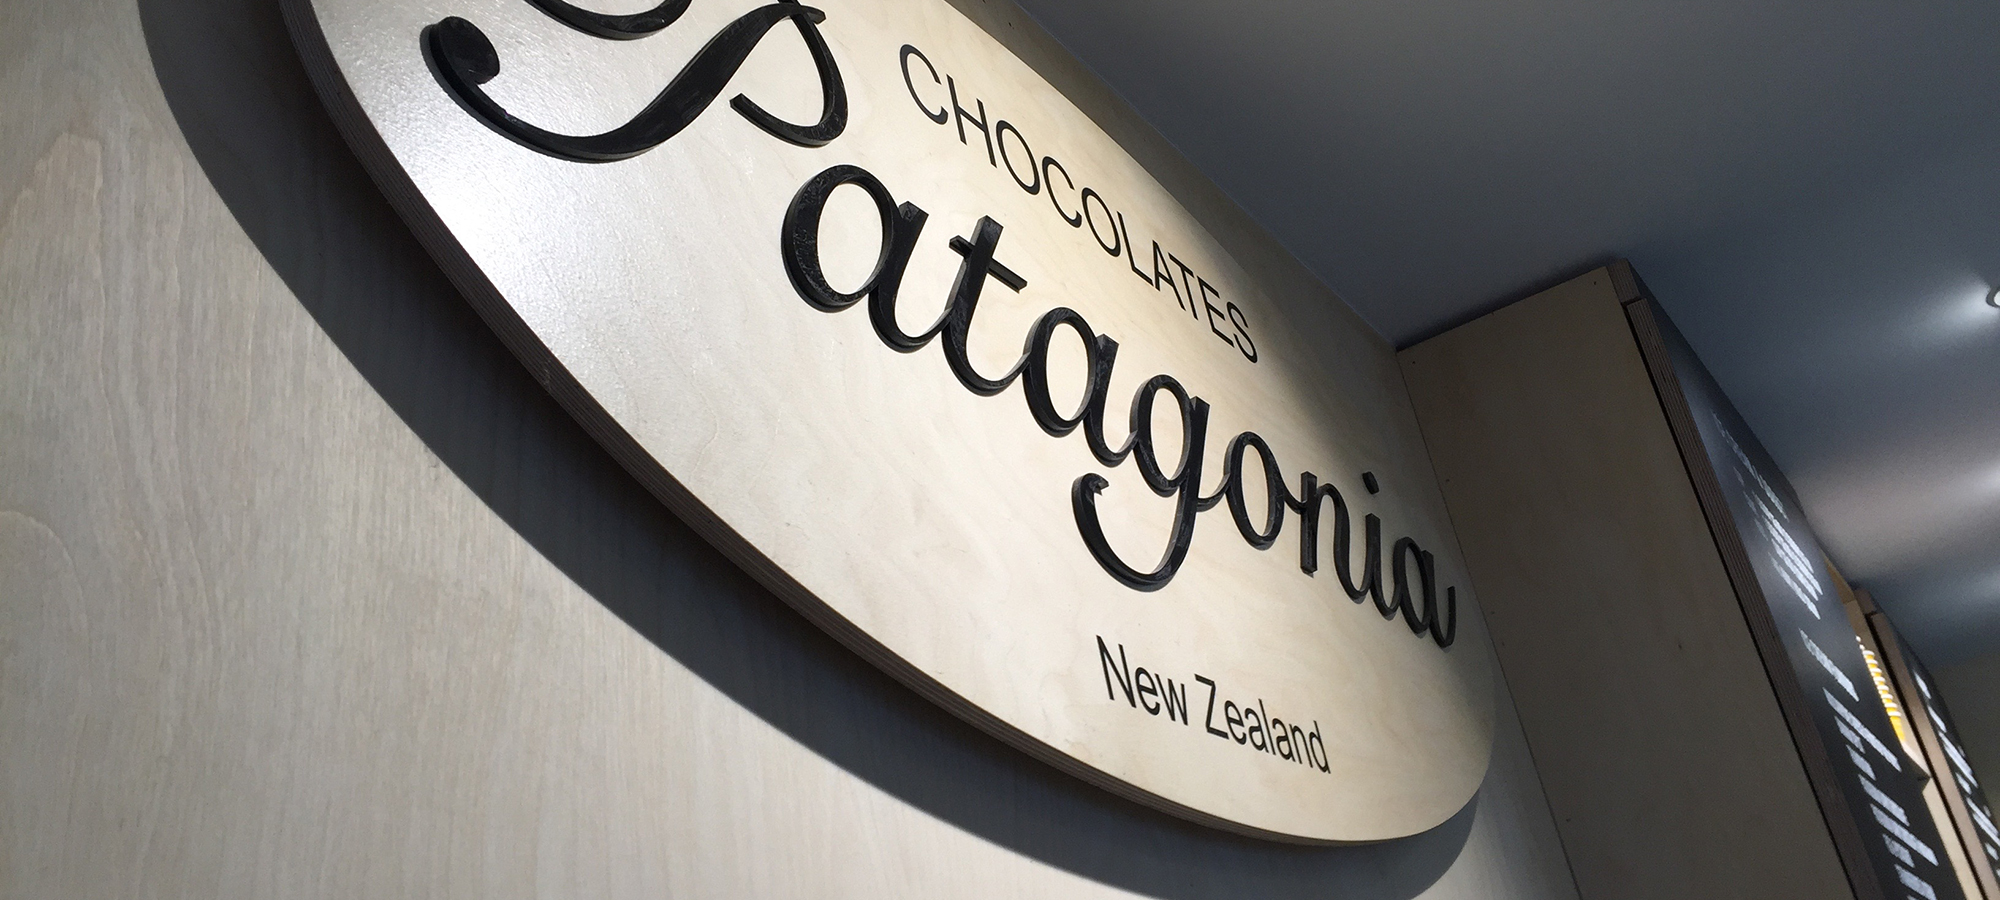 Patagonia Chocolates 3D